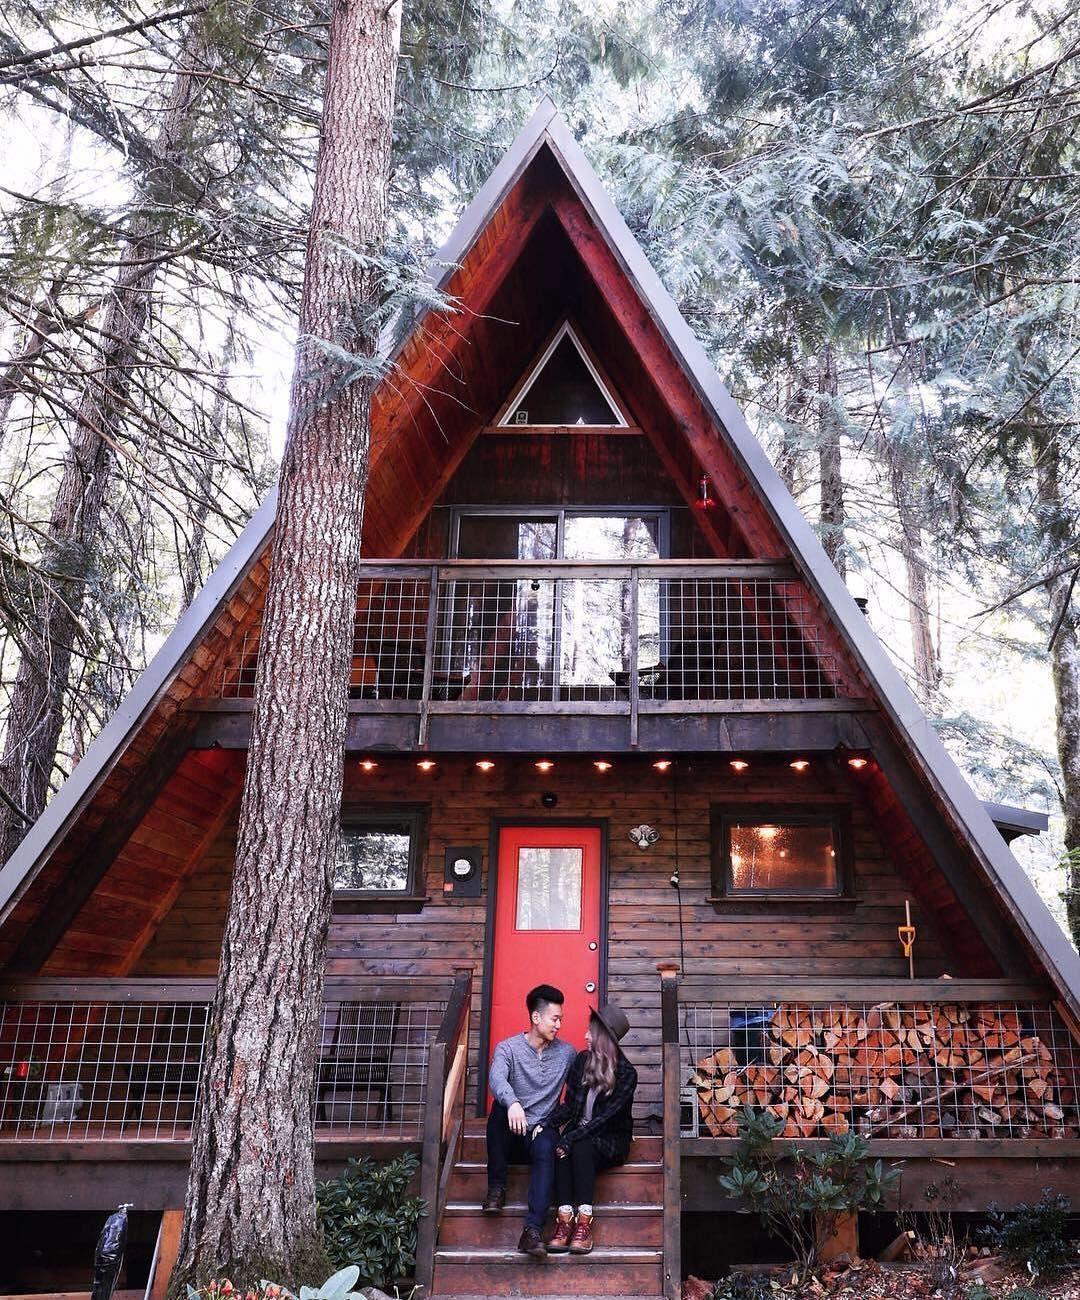 rent nostalgia the portable to c cottage in rental washington marlin tiny home cedar cabins